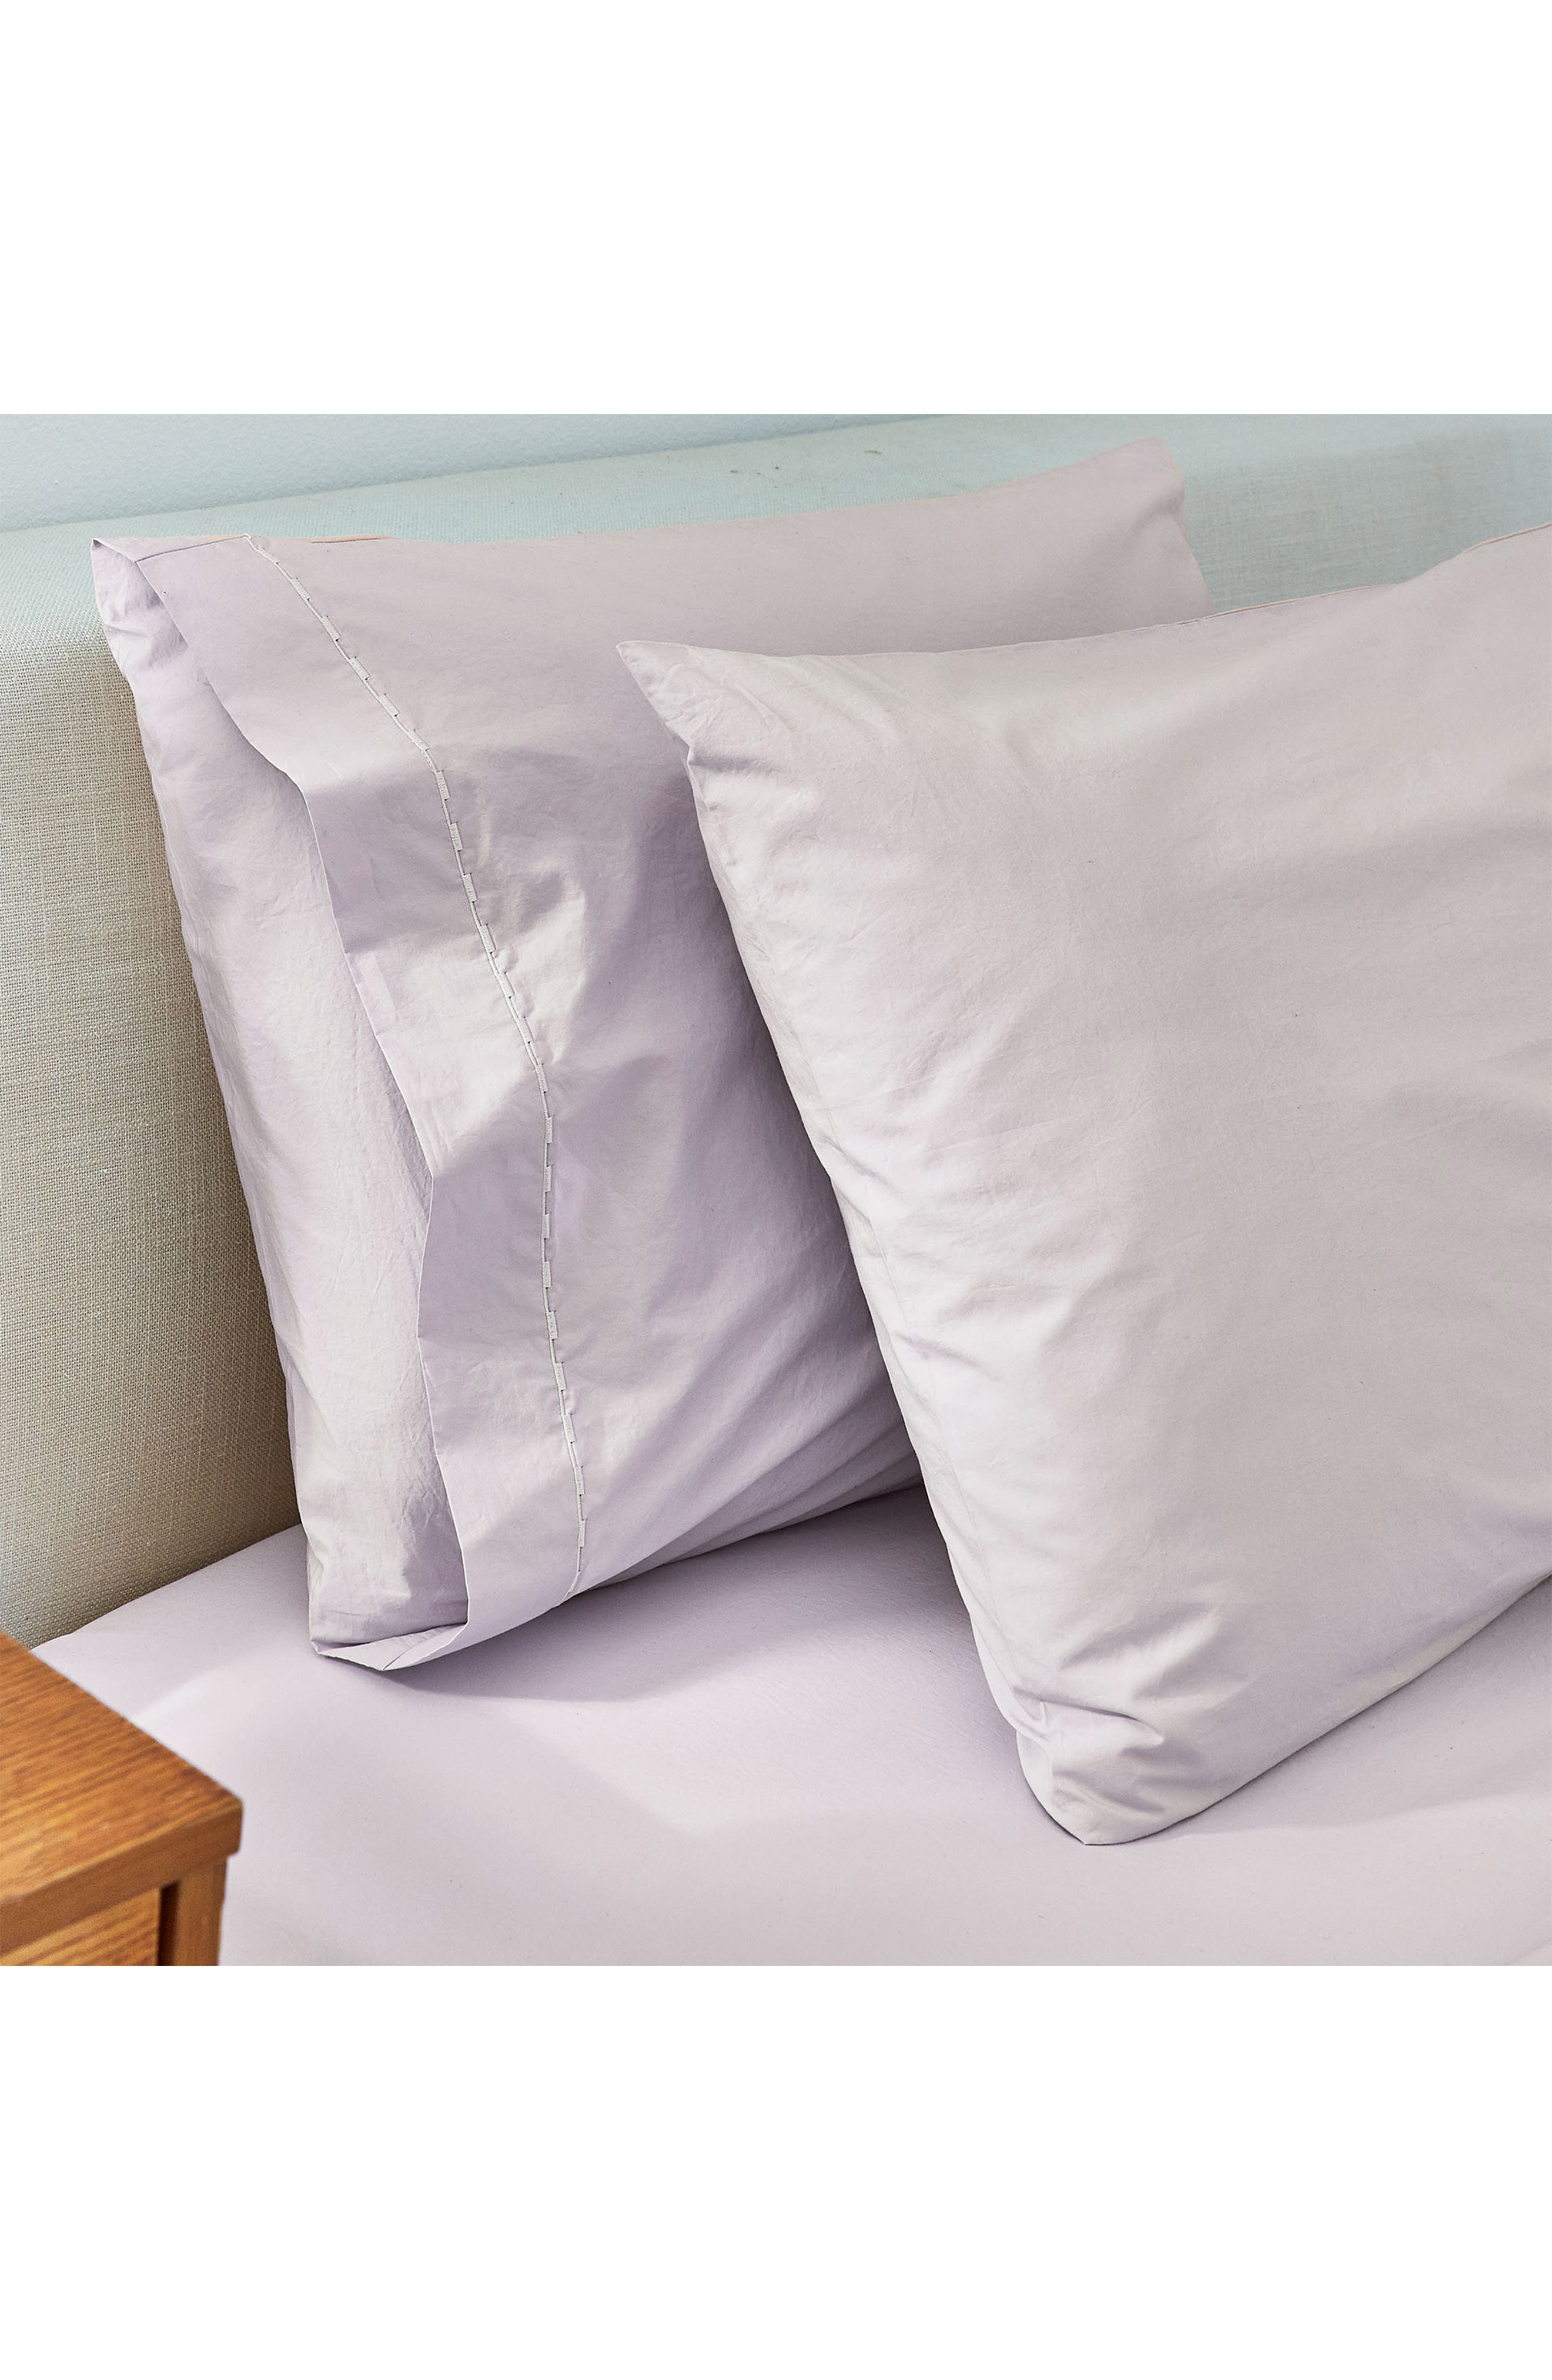 SPLENDID HOME DECOR,                             Spendid Home Decor Cotton Percale Pillowcases,                             Main thumbnail 1, color,                             MIST